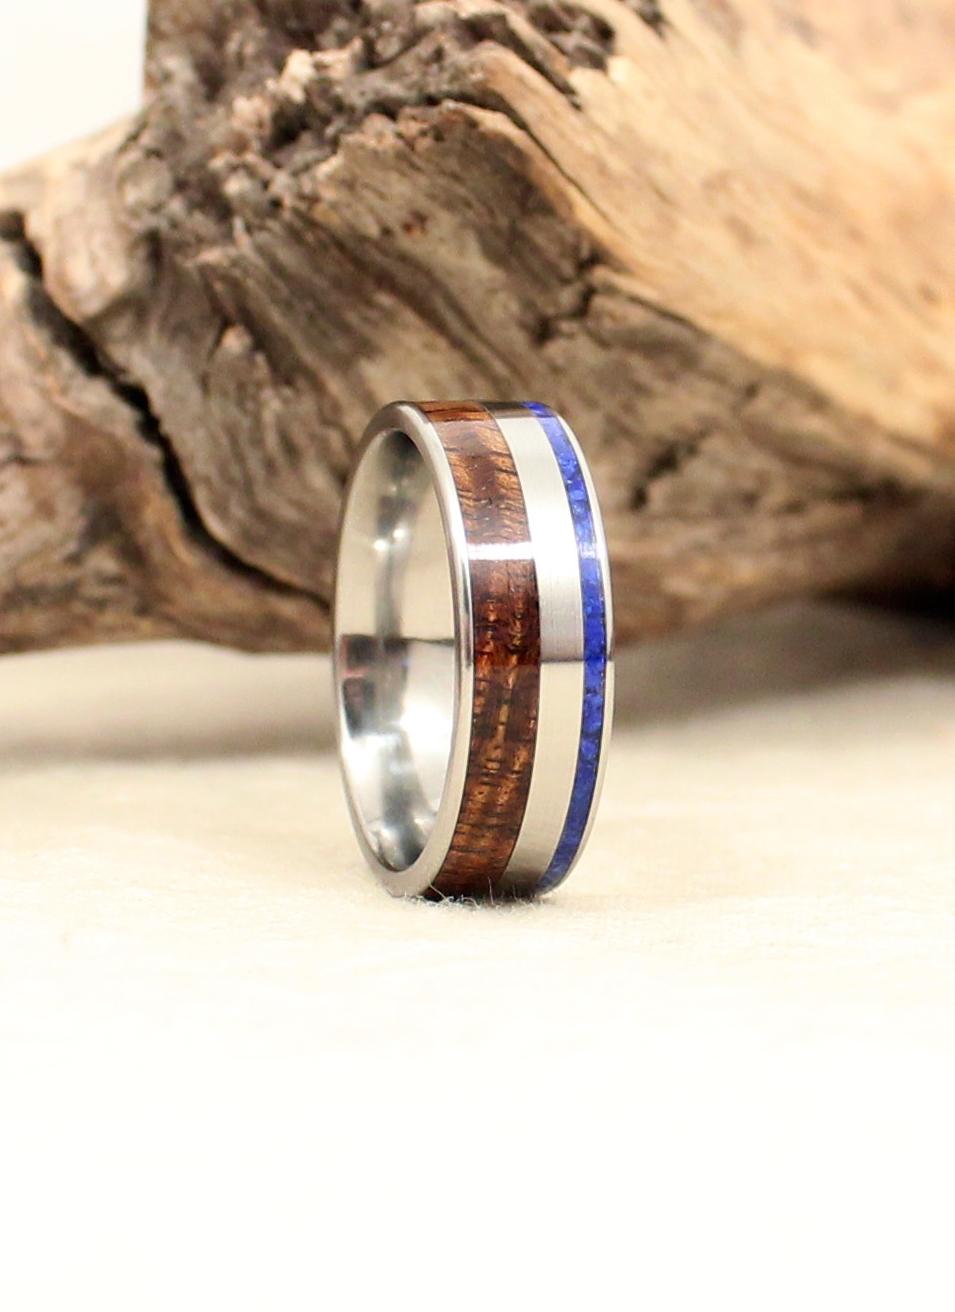 Hawaiian Koa Wooden Ring and Lapis Lazuli Deconstructed Titanium